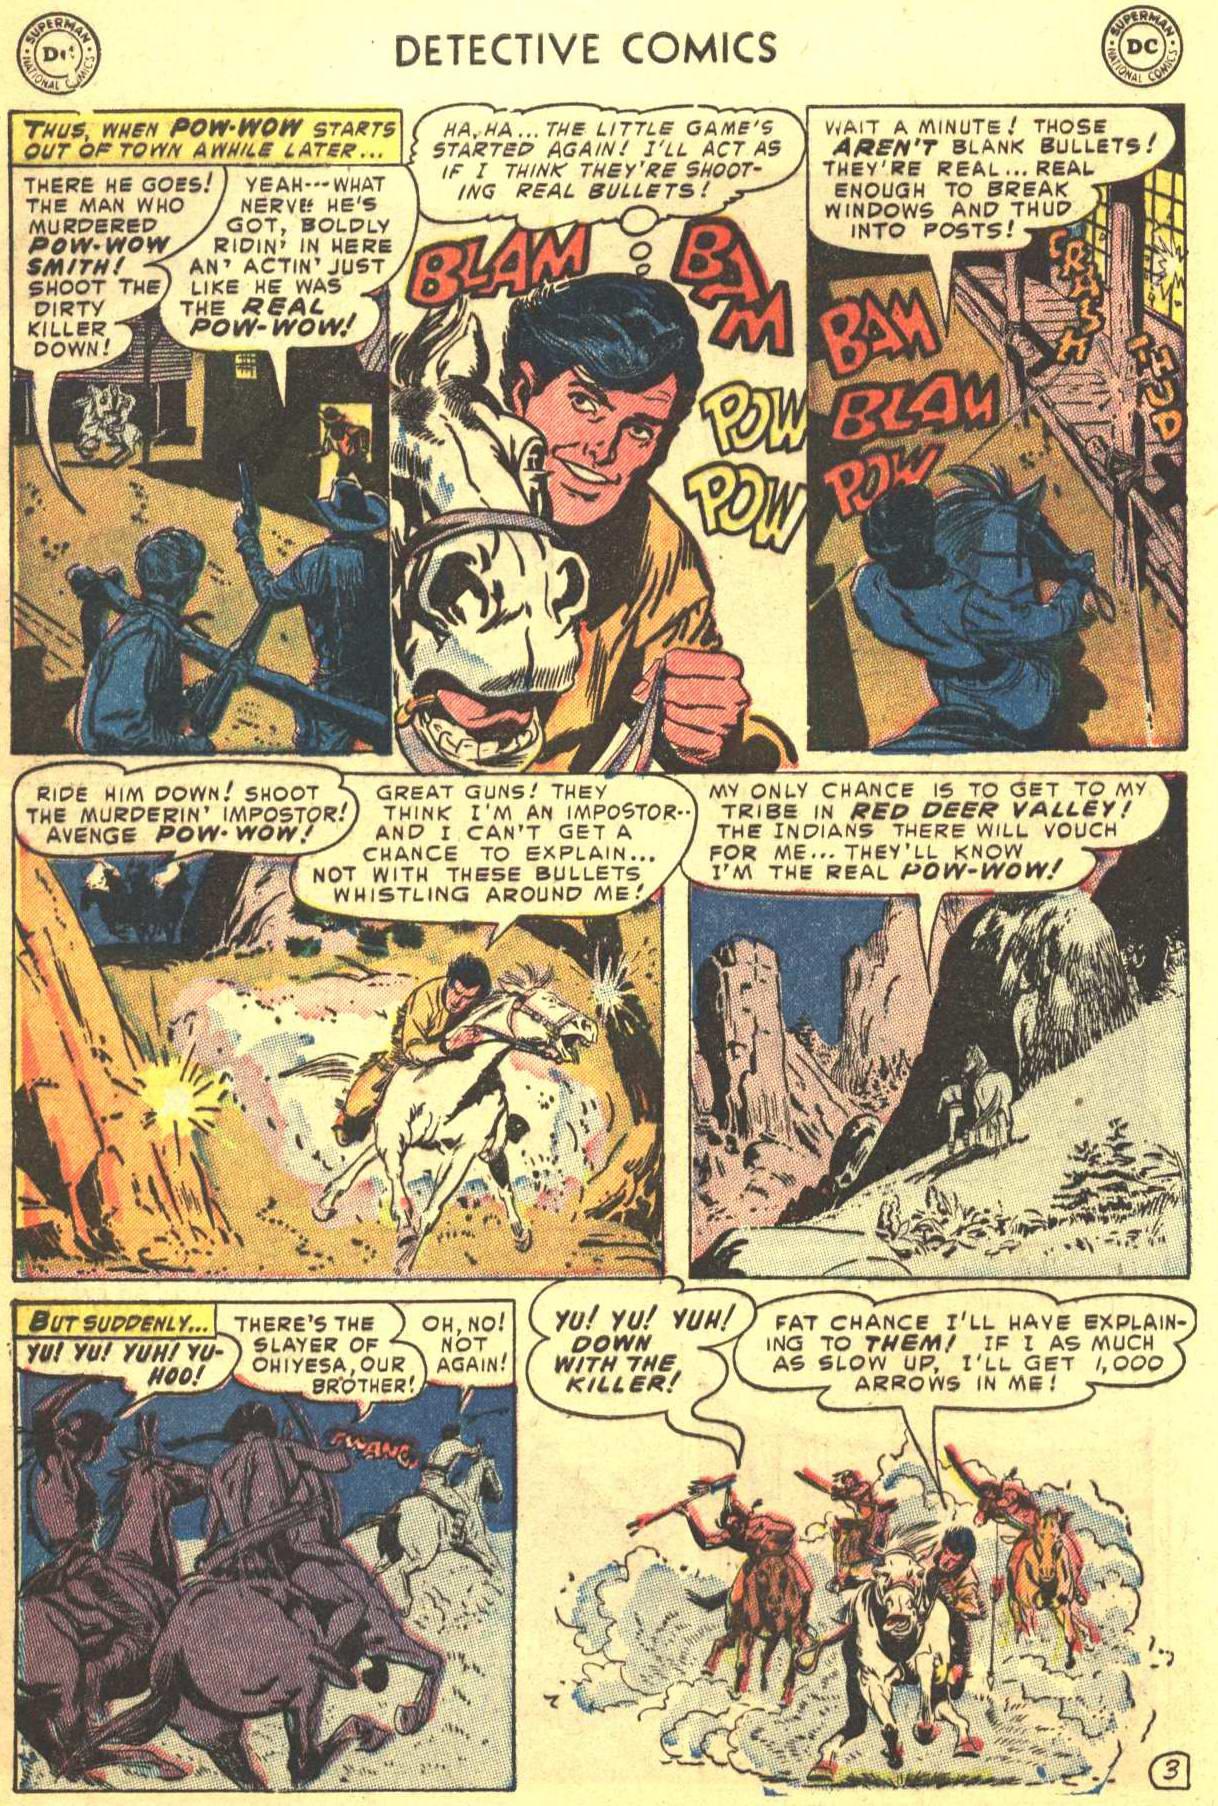 Detective Comics (1937) 198 Page 35